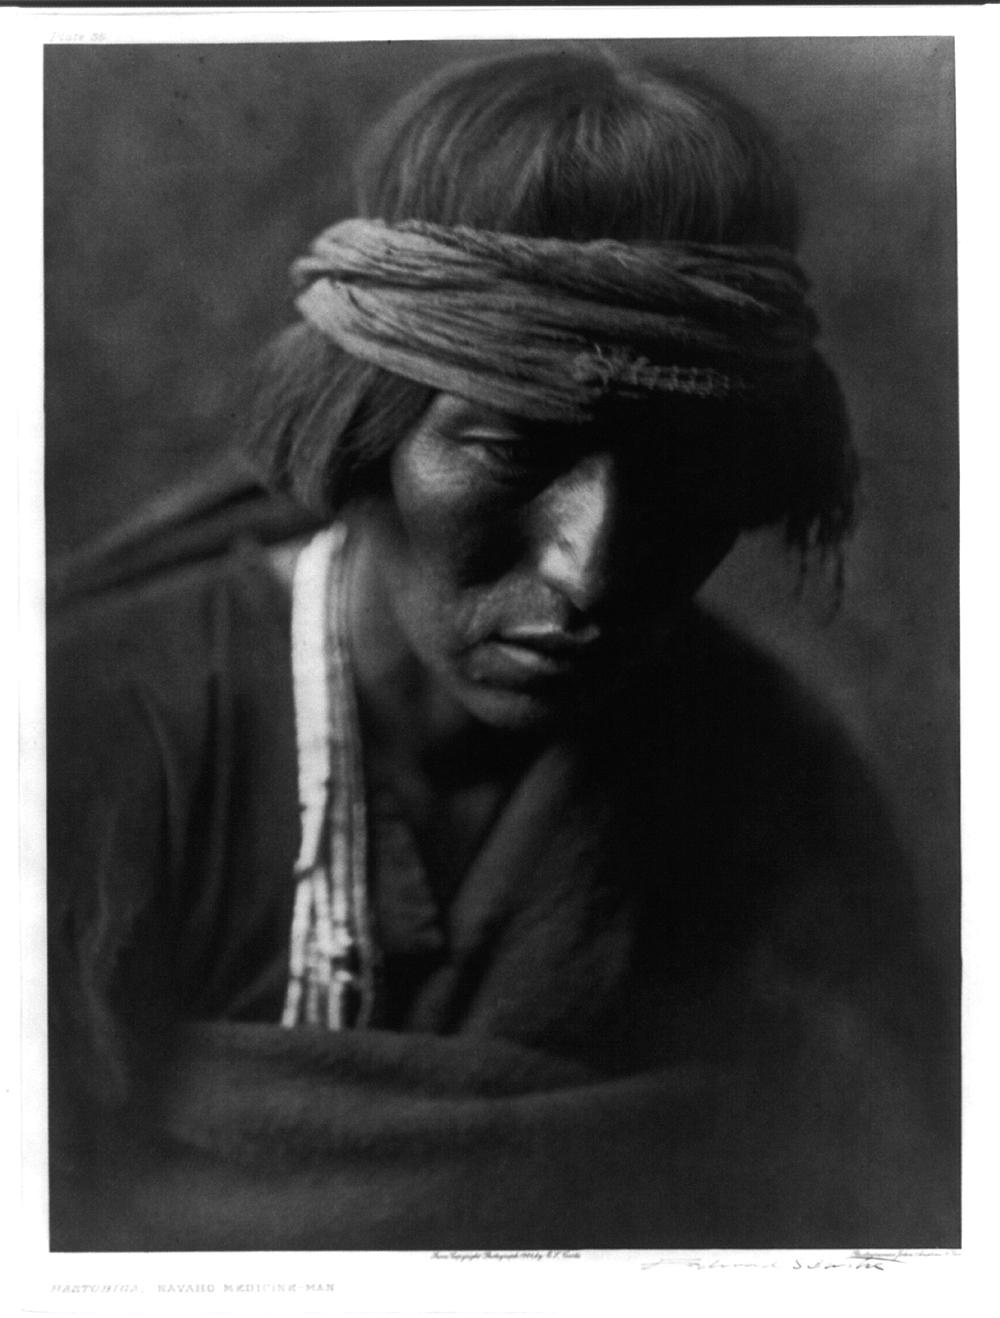 Hastobiga, Navaho Medicine Man